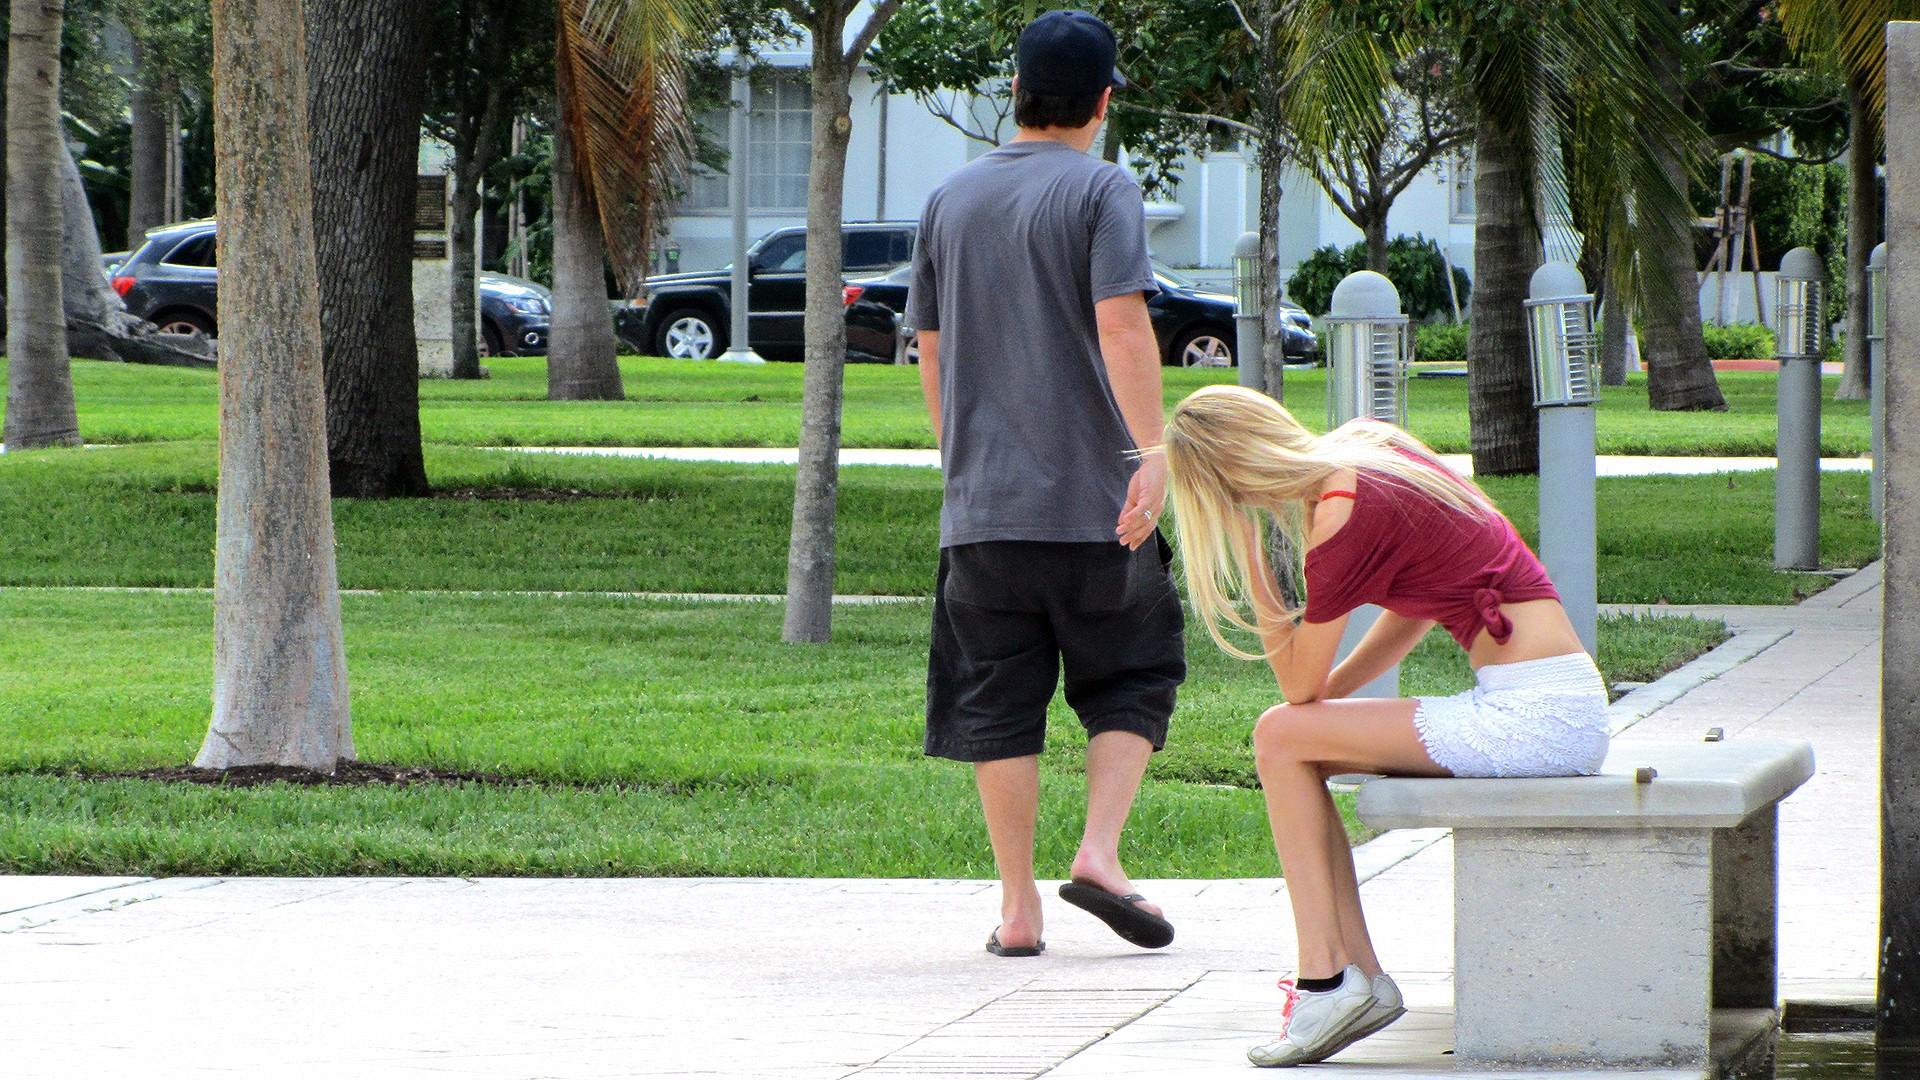 Blonde Bangs In the Back-Seat - Stranded Teens